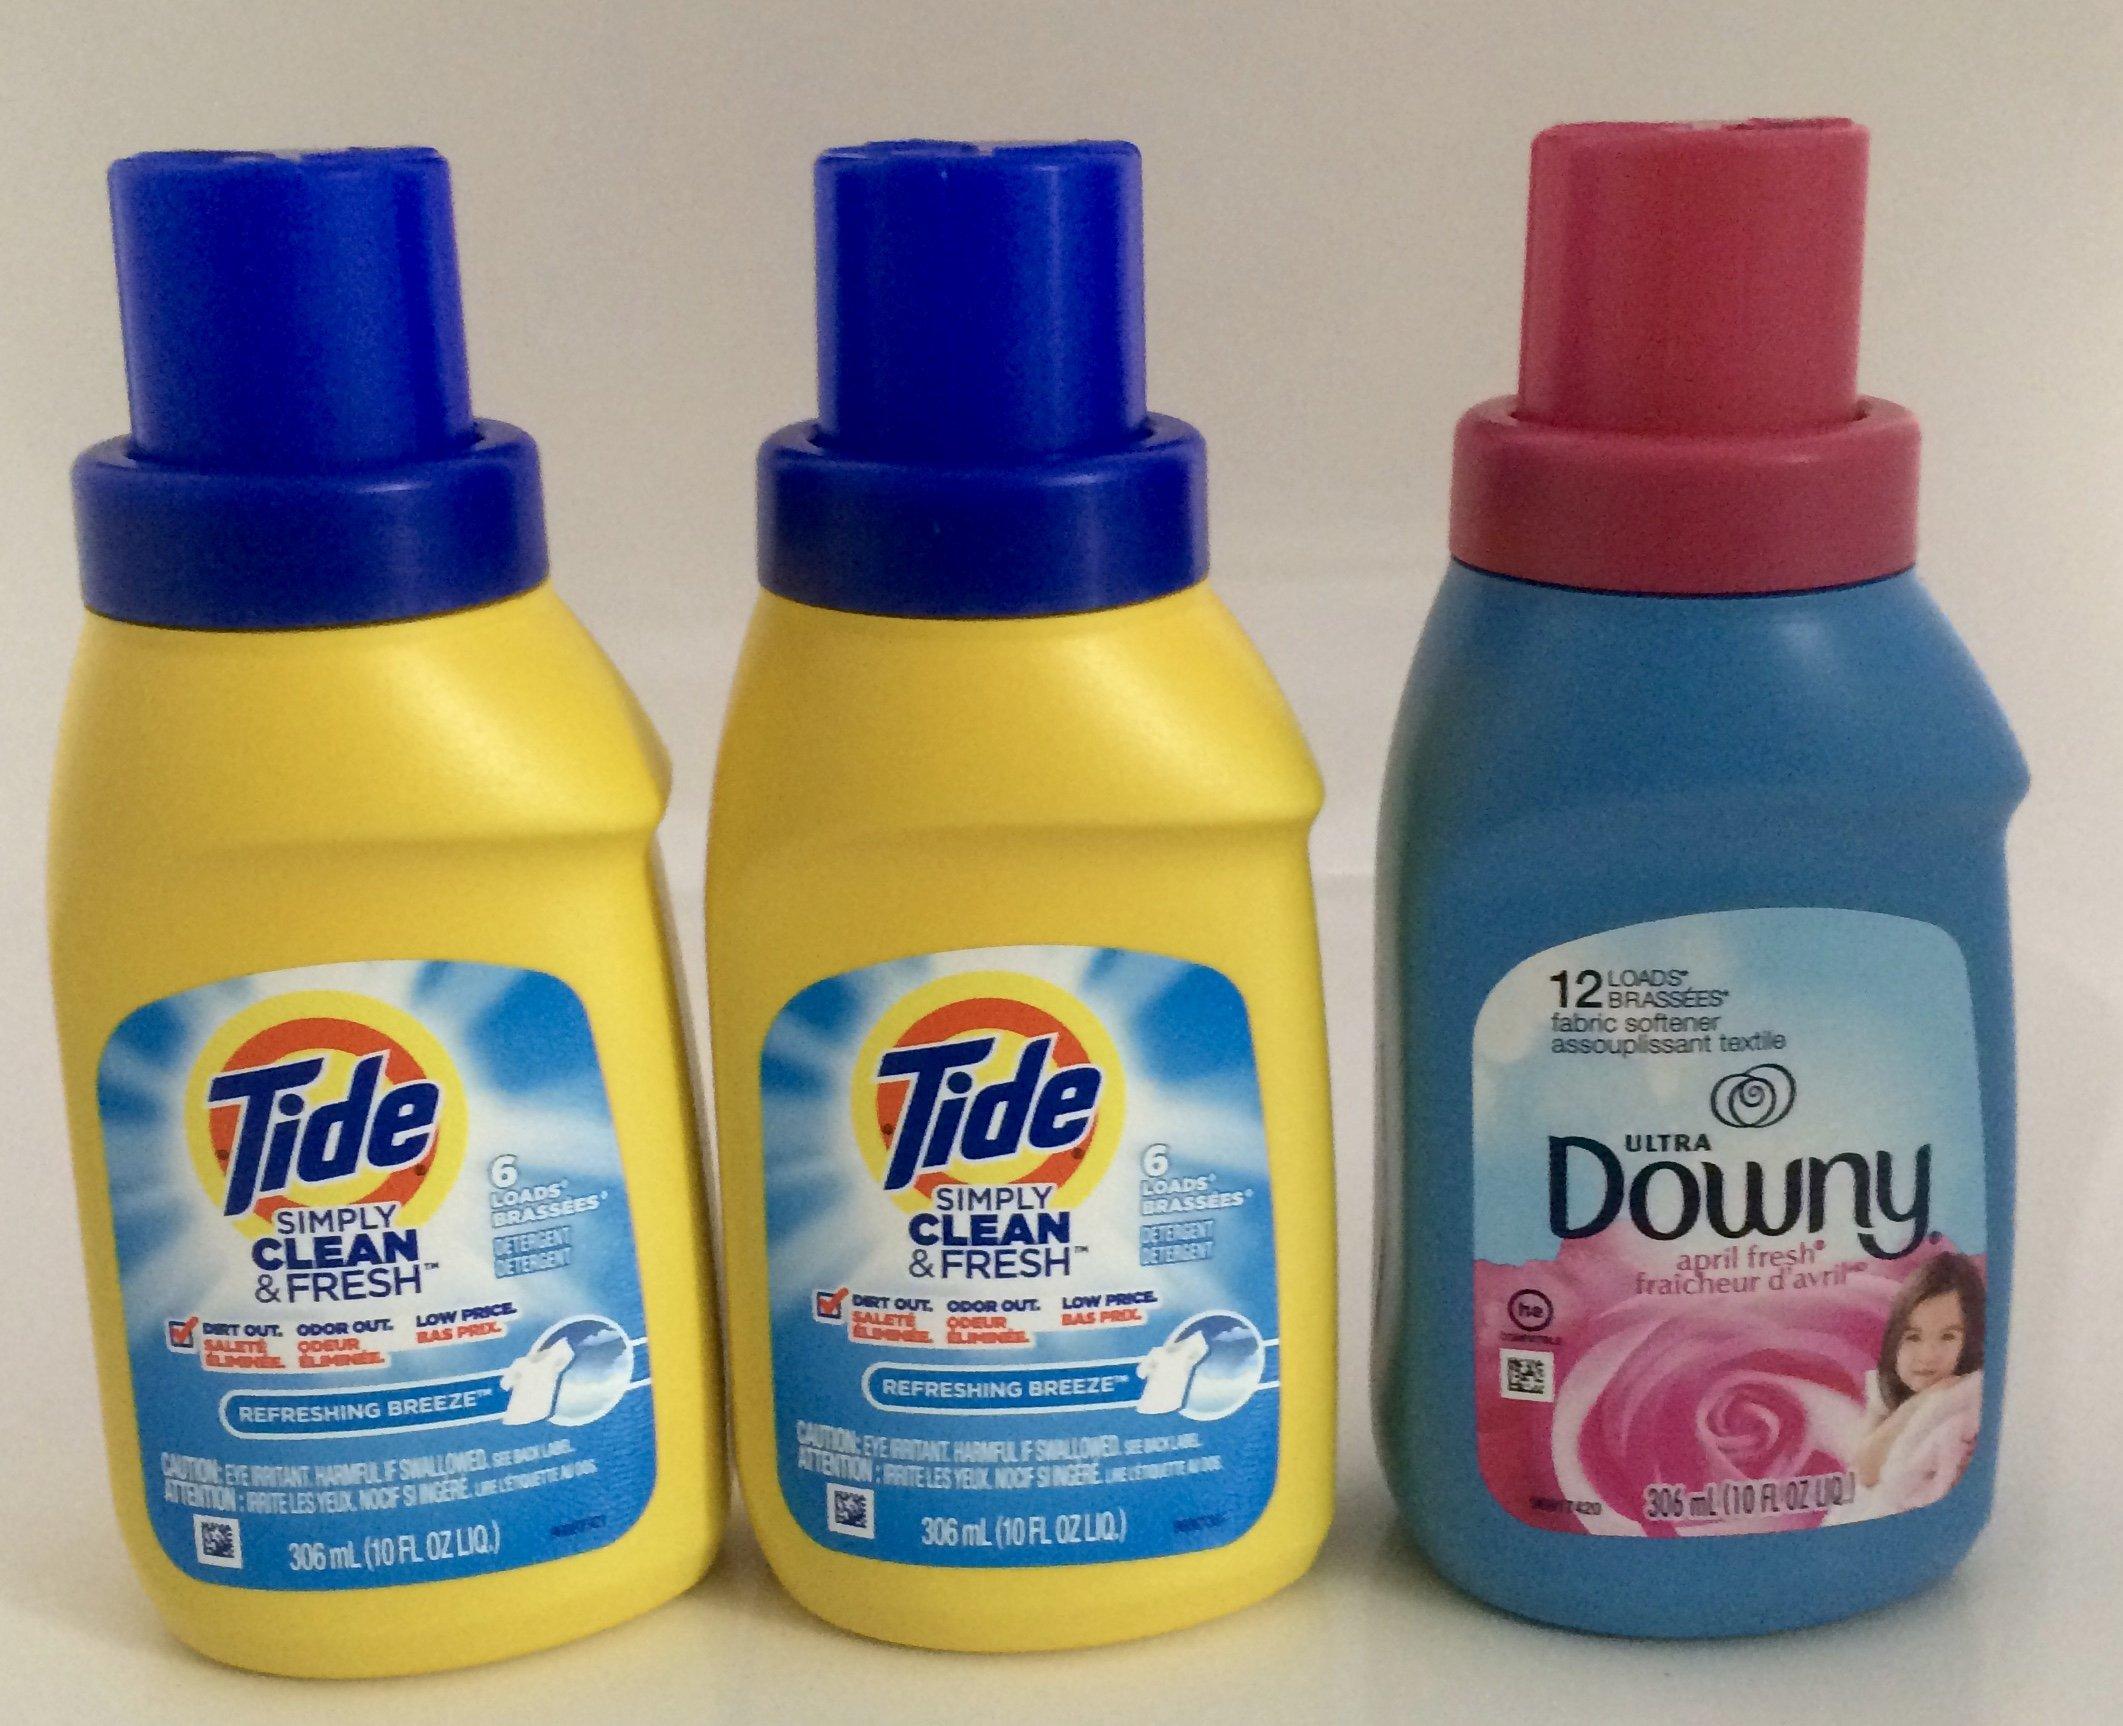 Travel Size Bundle (2) Tide 10oz Refreshing Breeze Laundry Detergent & Downy Ultra April Fresh Liquid Fabric Softener, 10 Oz